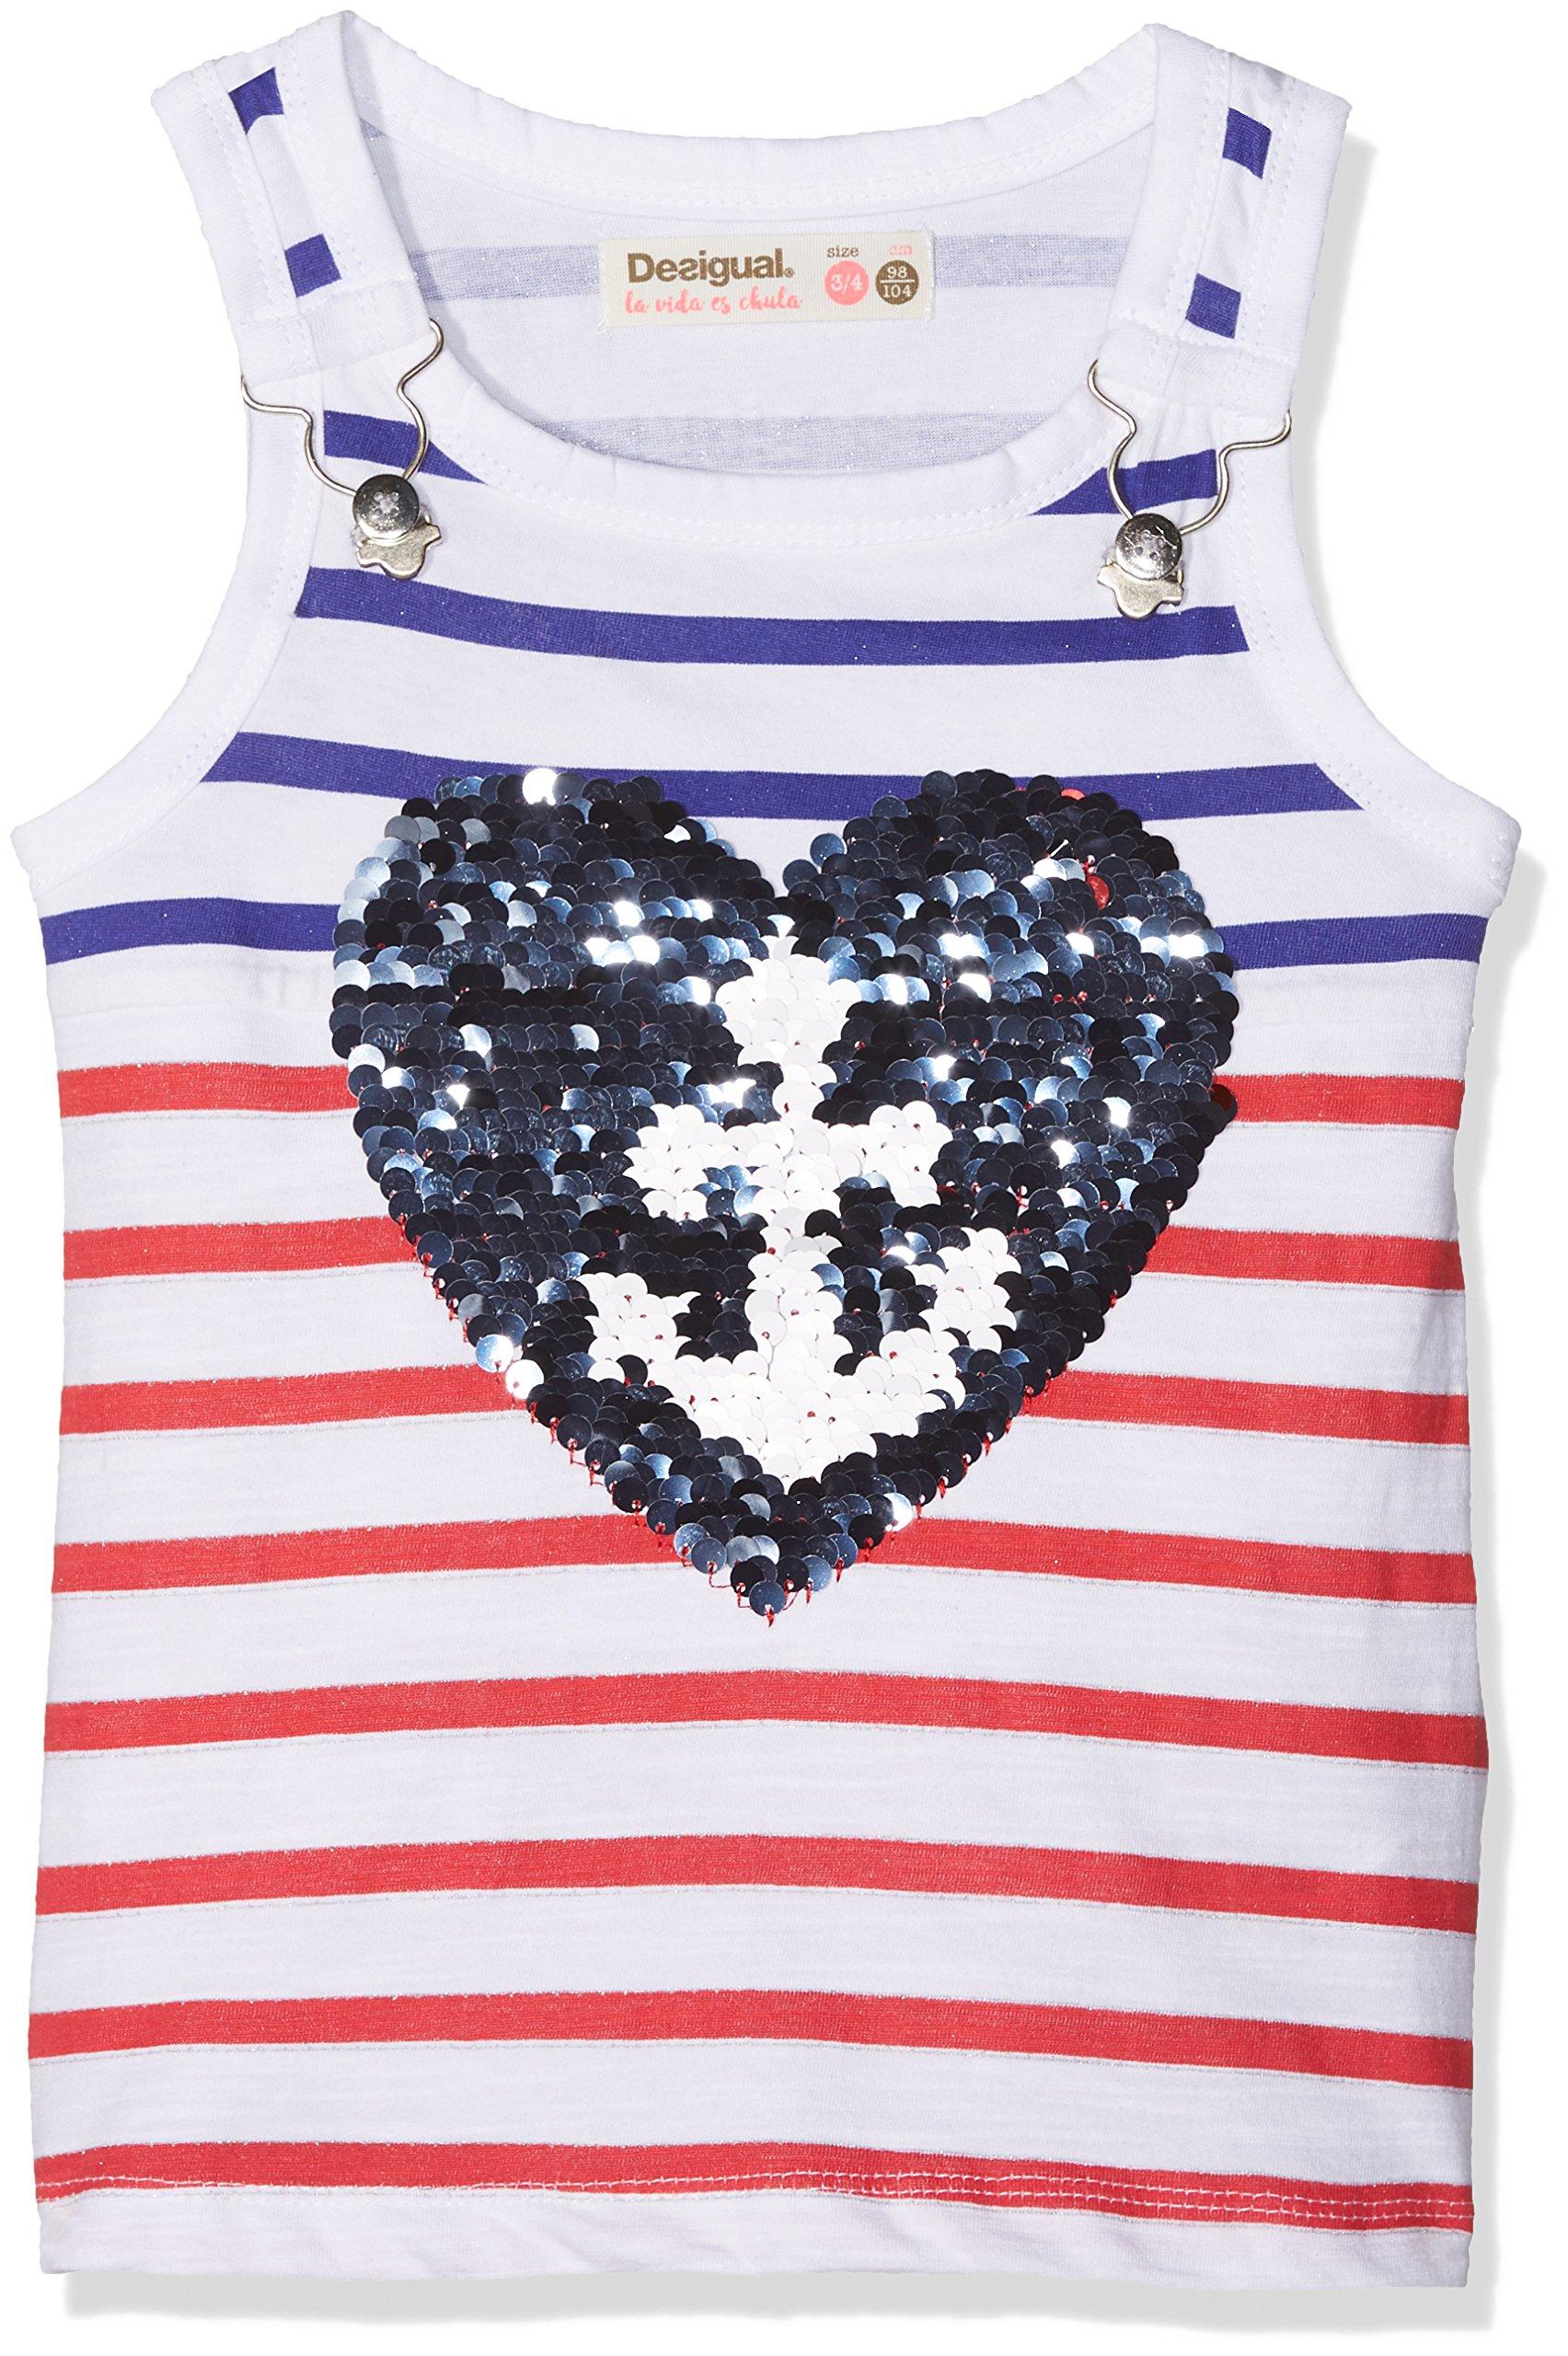 Desigual TS_Regina Camiseta para Niñas